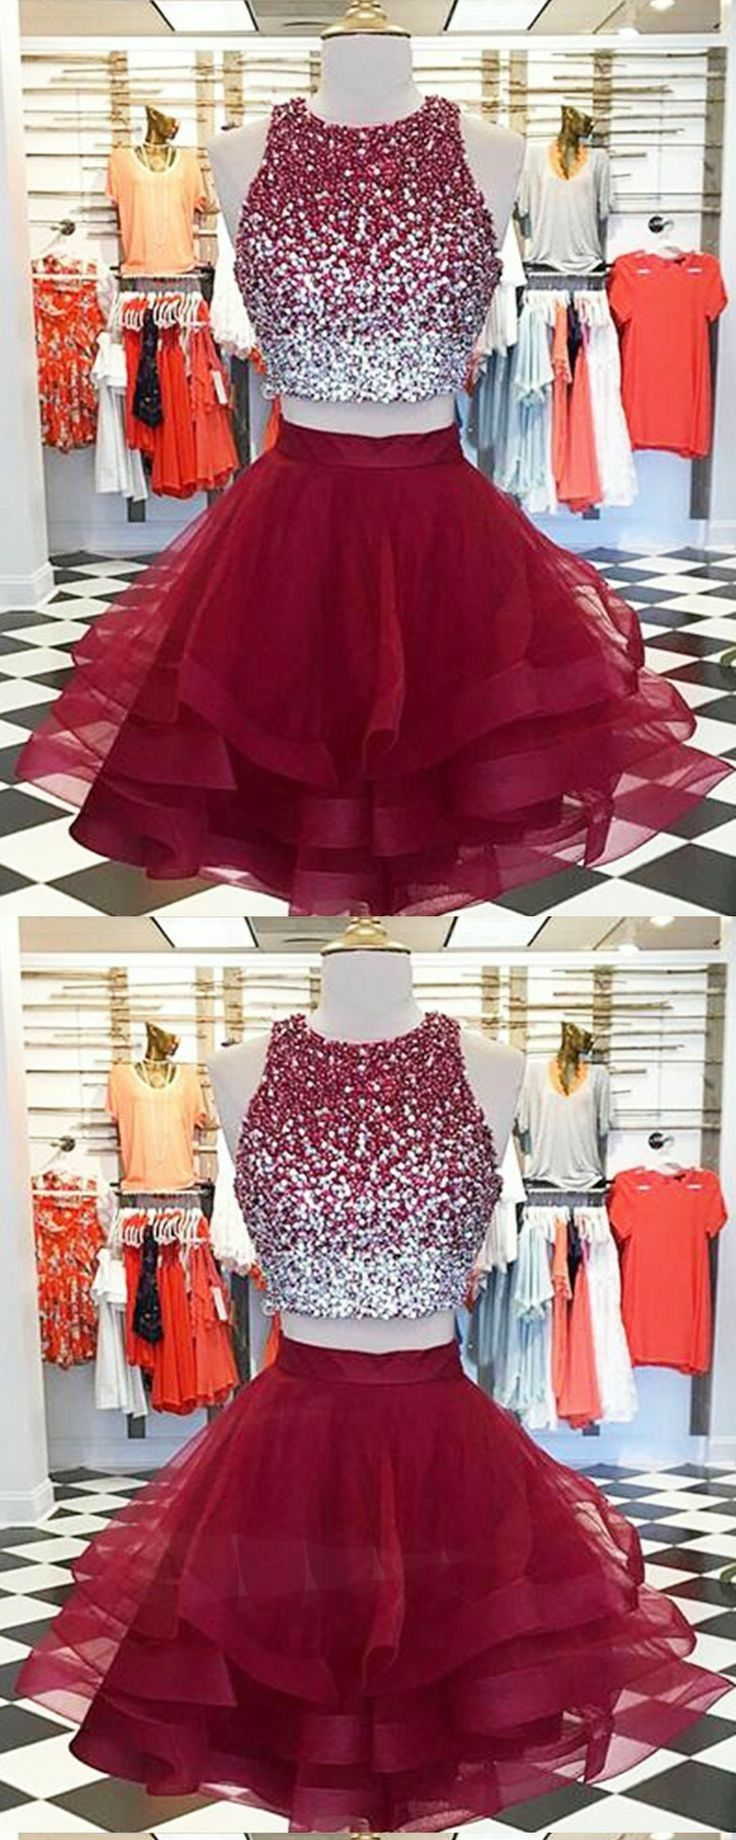 Pin von Olivia Fitzmaurice auf Homecoming and prom dresses ...